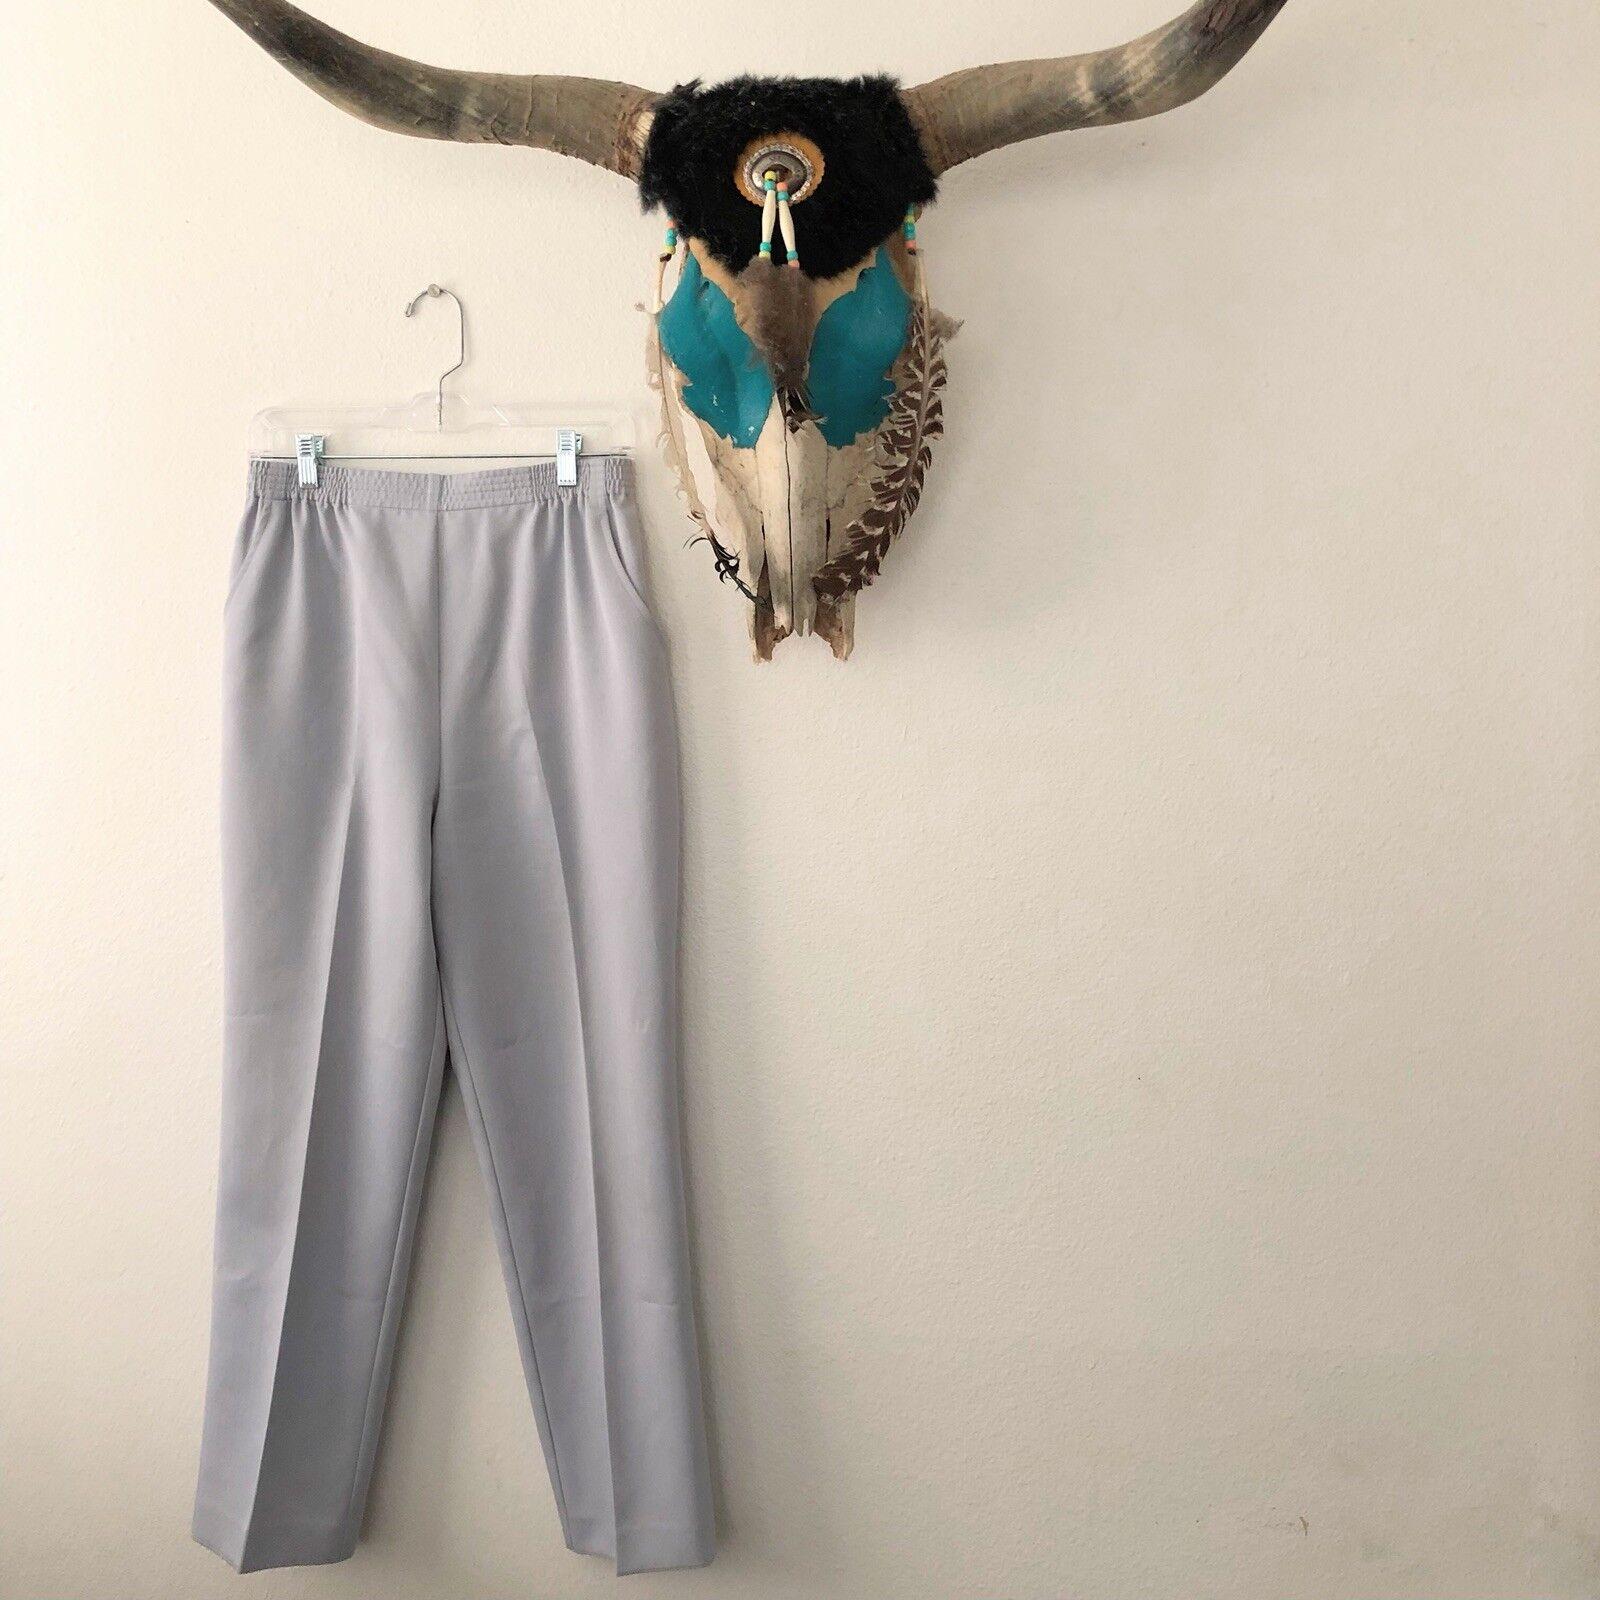 ❌MAKE OFFER❌Sz M L Philippe Marques Petites Pants